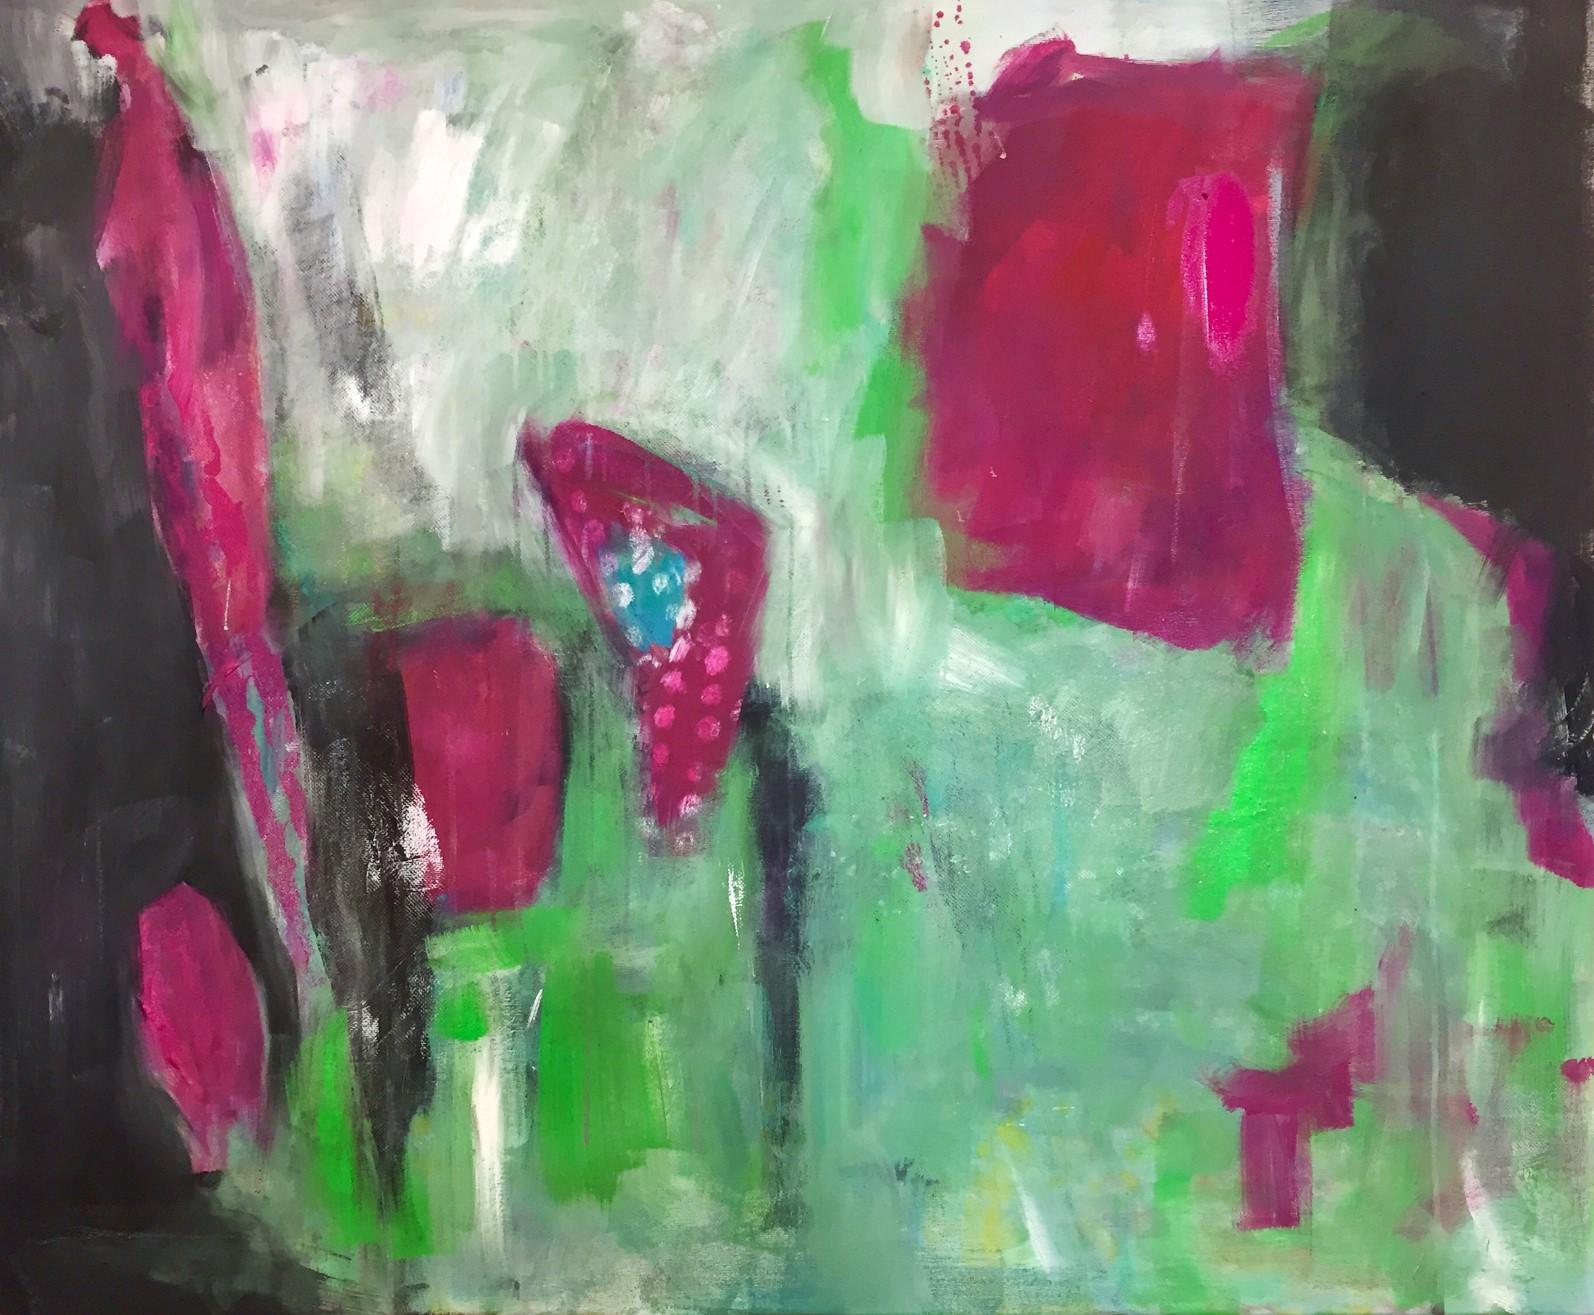 Blumen im Wind, Acryl auf Leinwand, 120x100cm